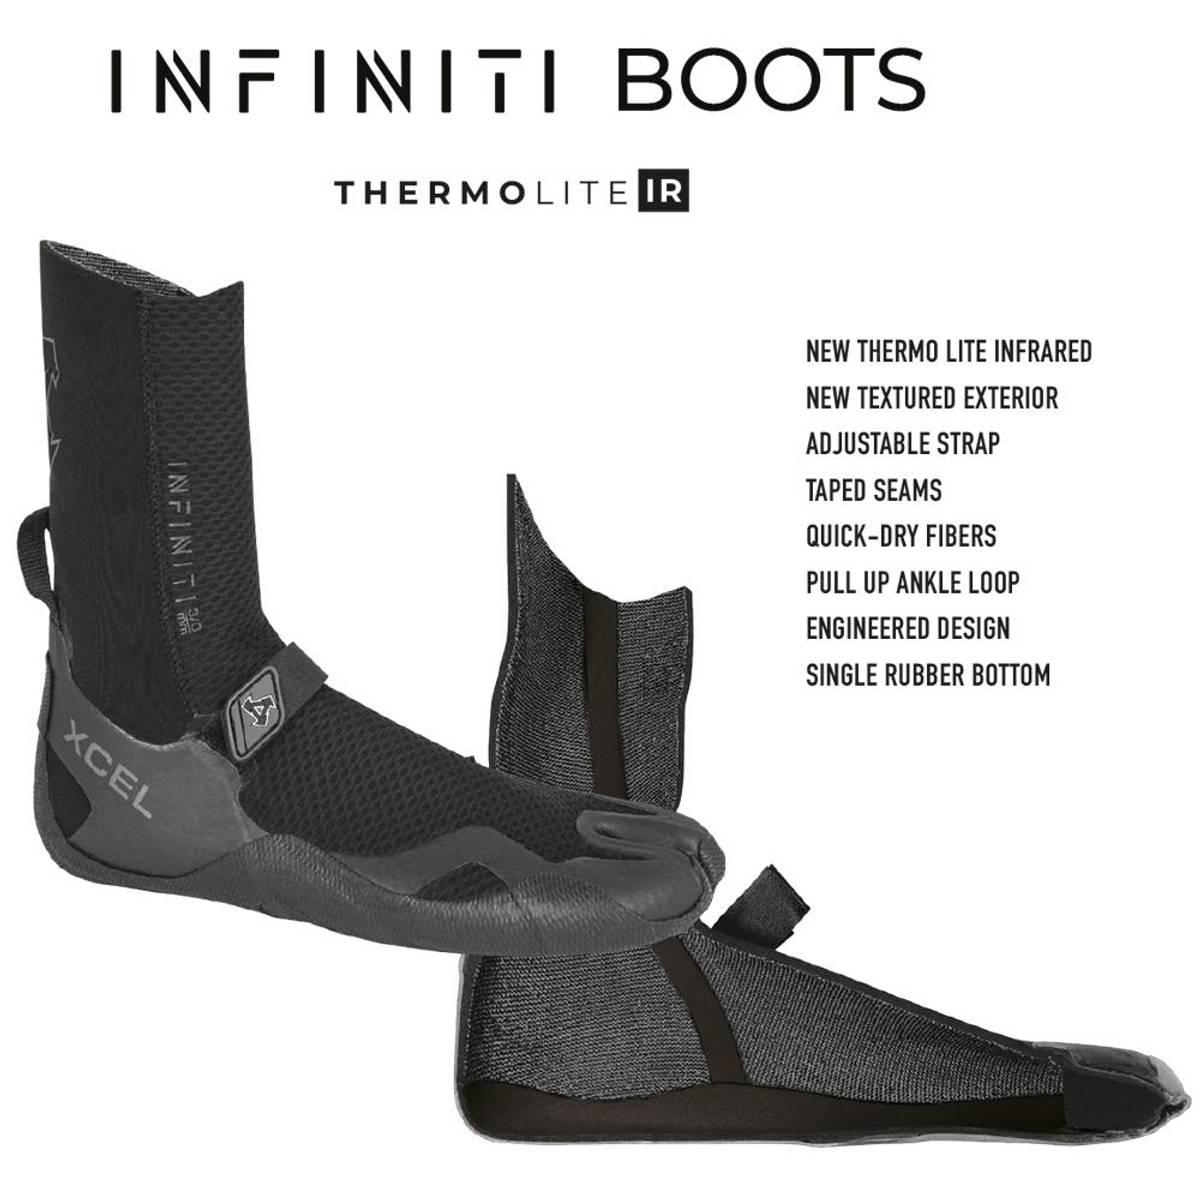 Xcel - 8mm Infiniti Round Toe Våtdraktsko (2021)